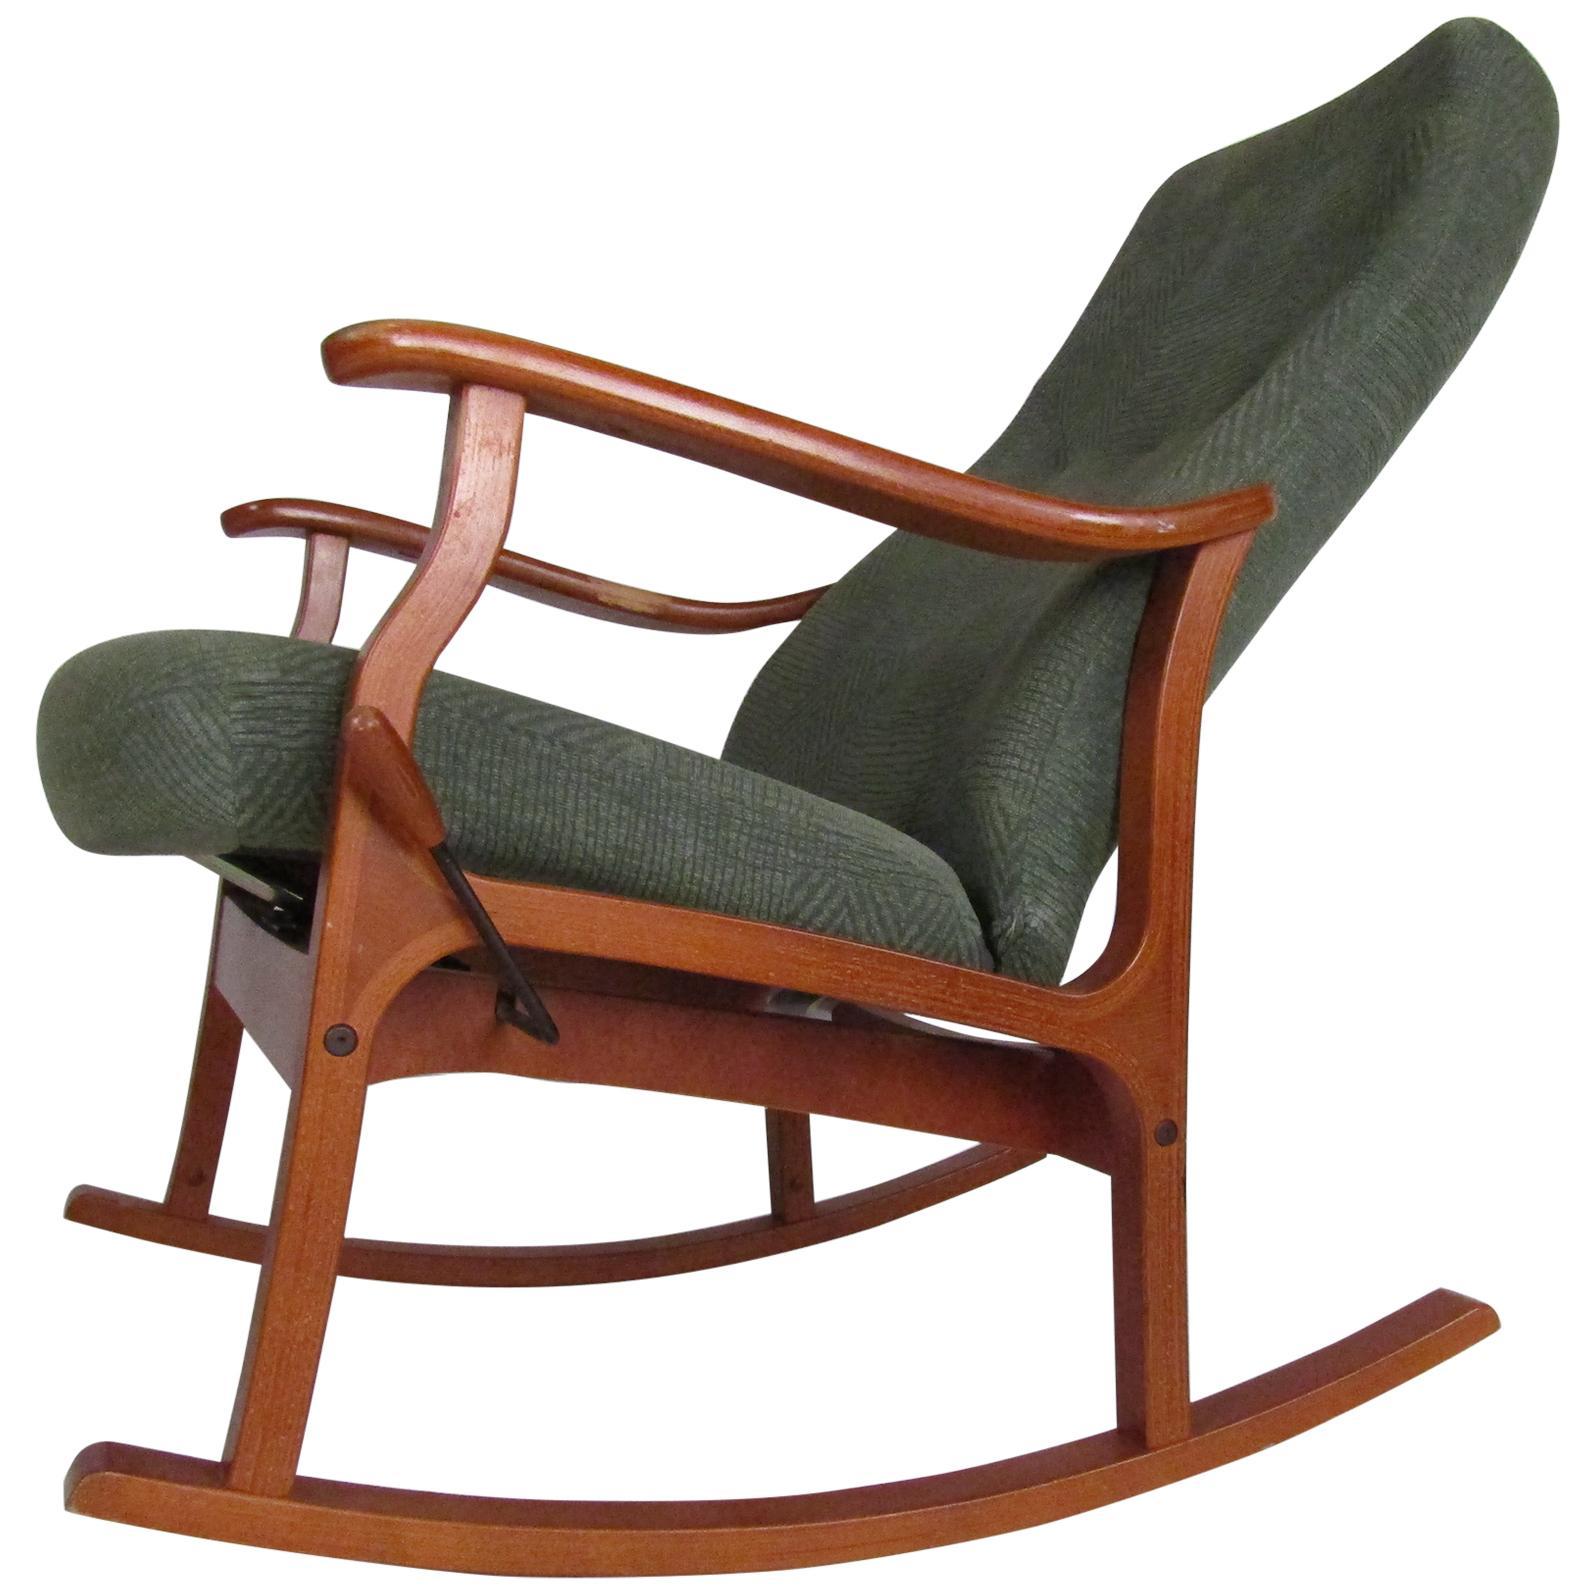 Mid-Century Modern Danish Teak Adjustable Rocking Chair